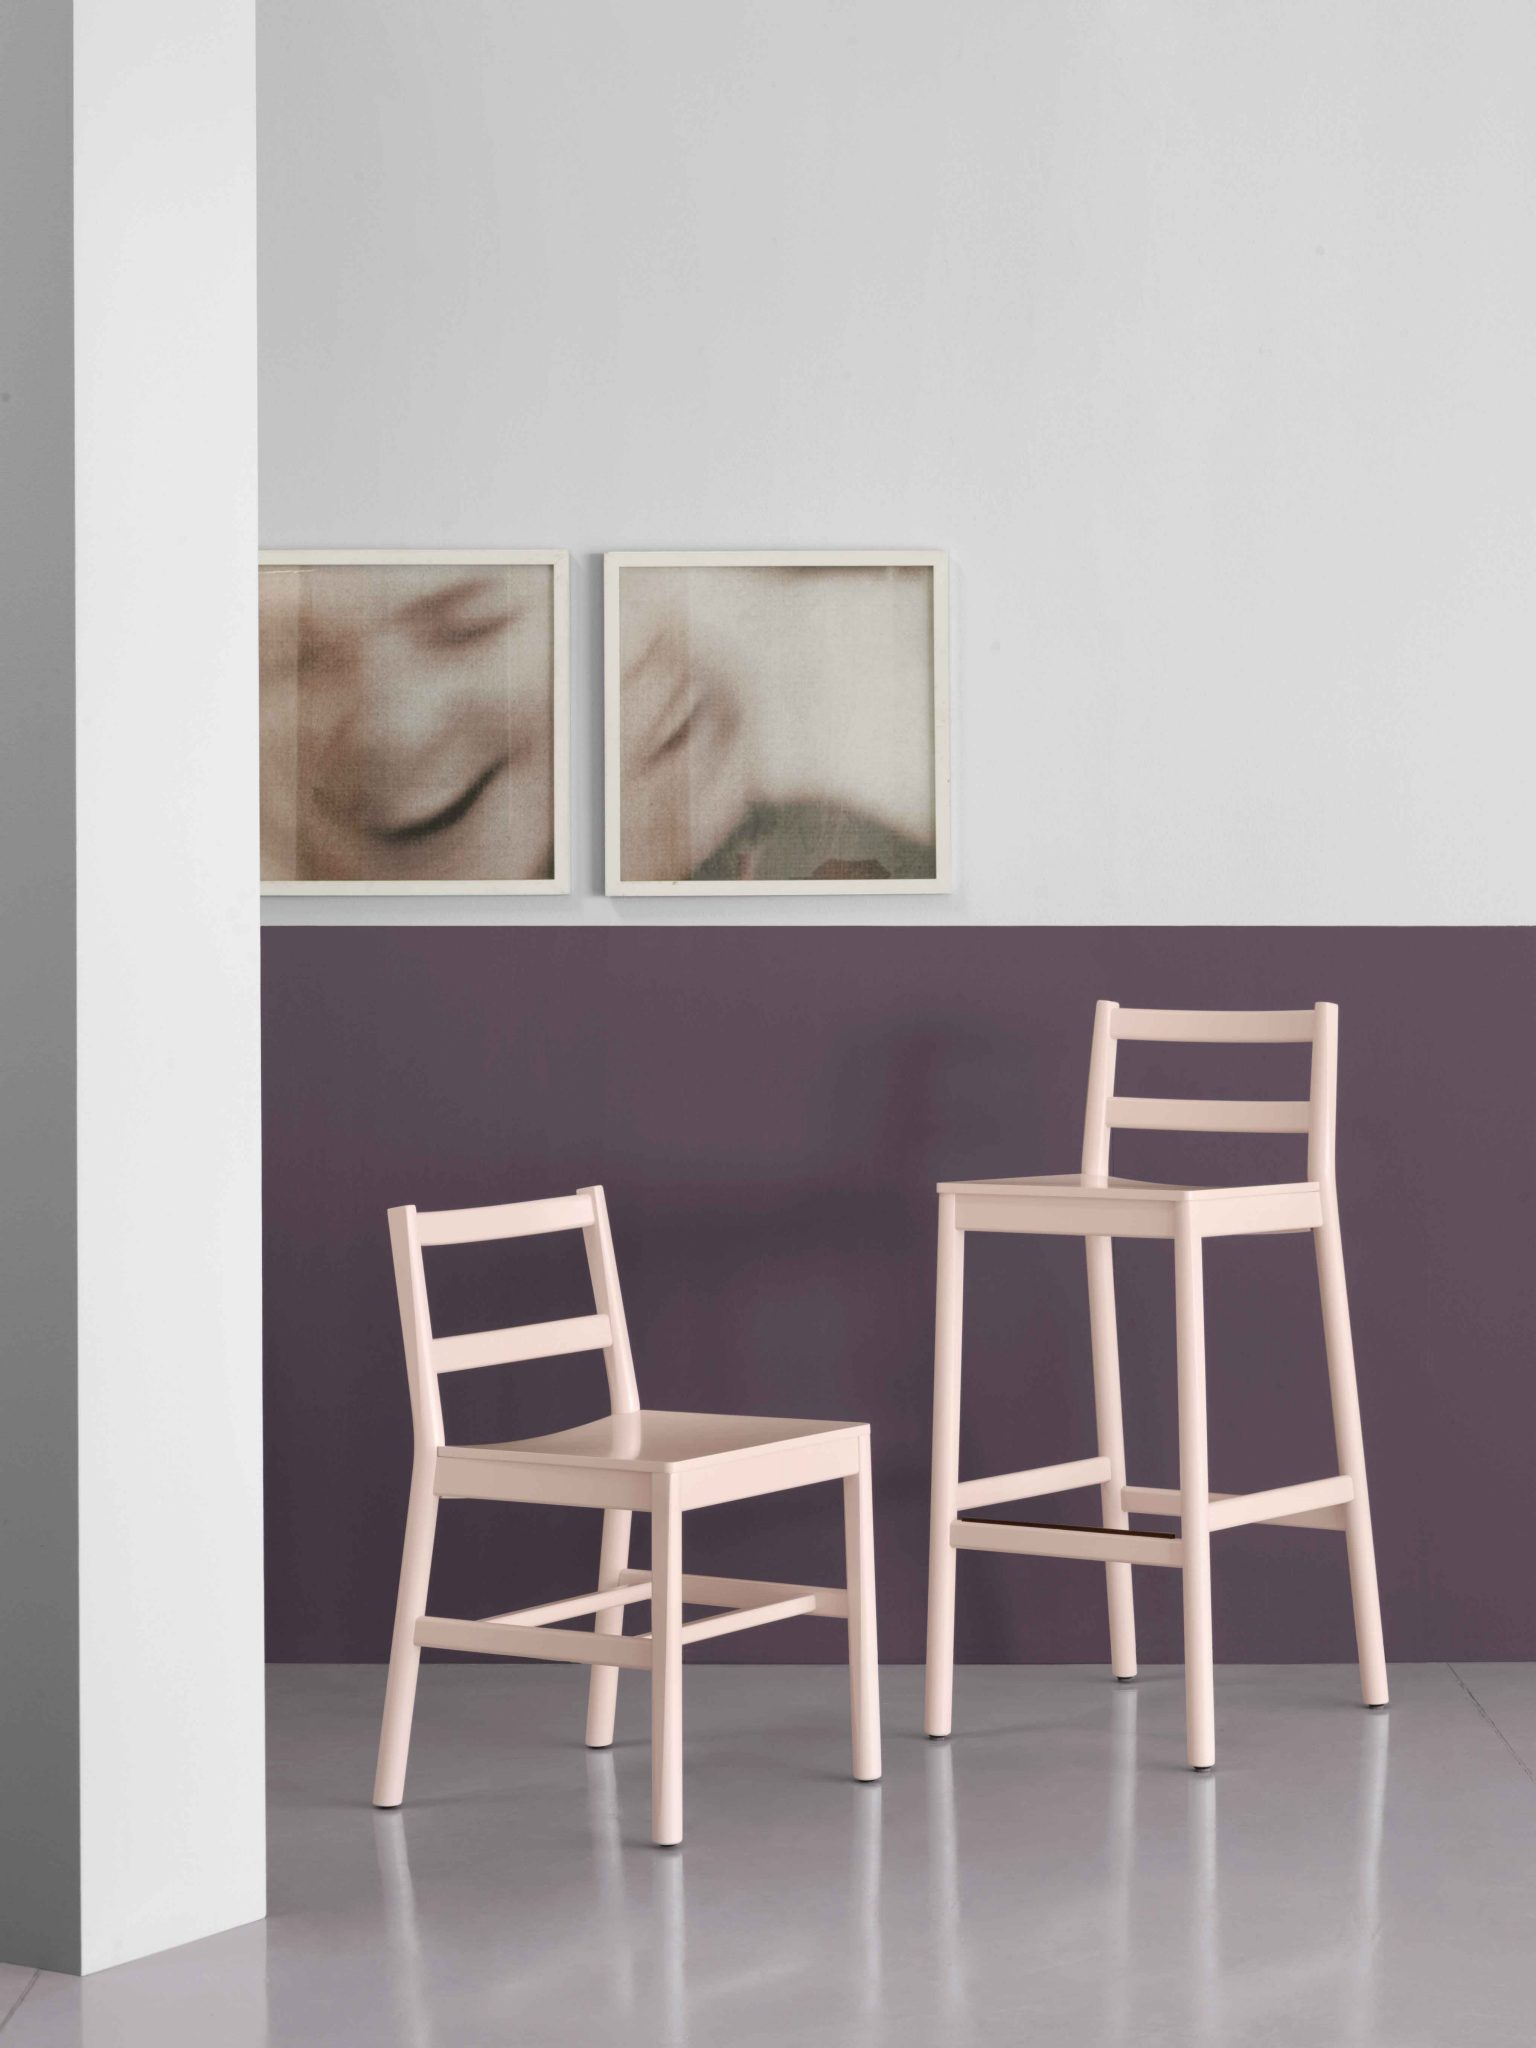 0020-LE-JULIE-0026-LE-JULIE-sedia-e-sgabello-sedile-legno-stool-and-chair-Julie-with-wood-seat